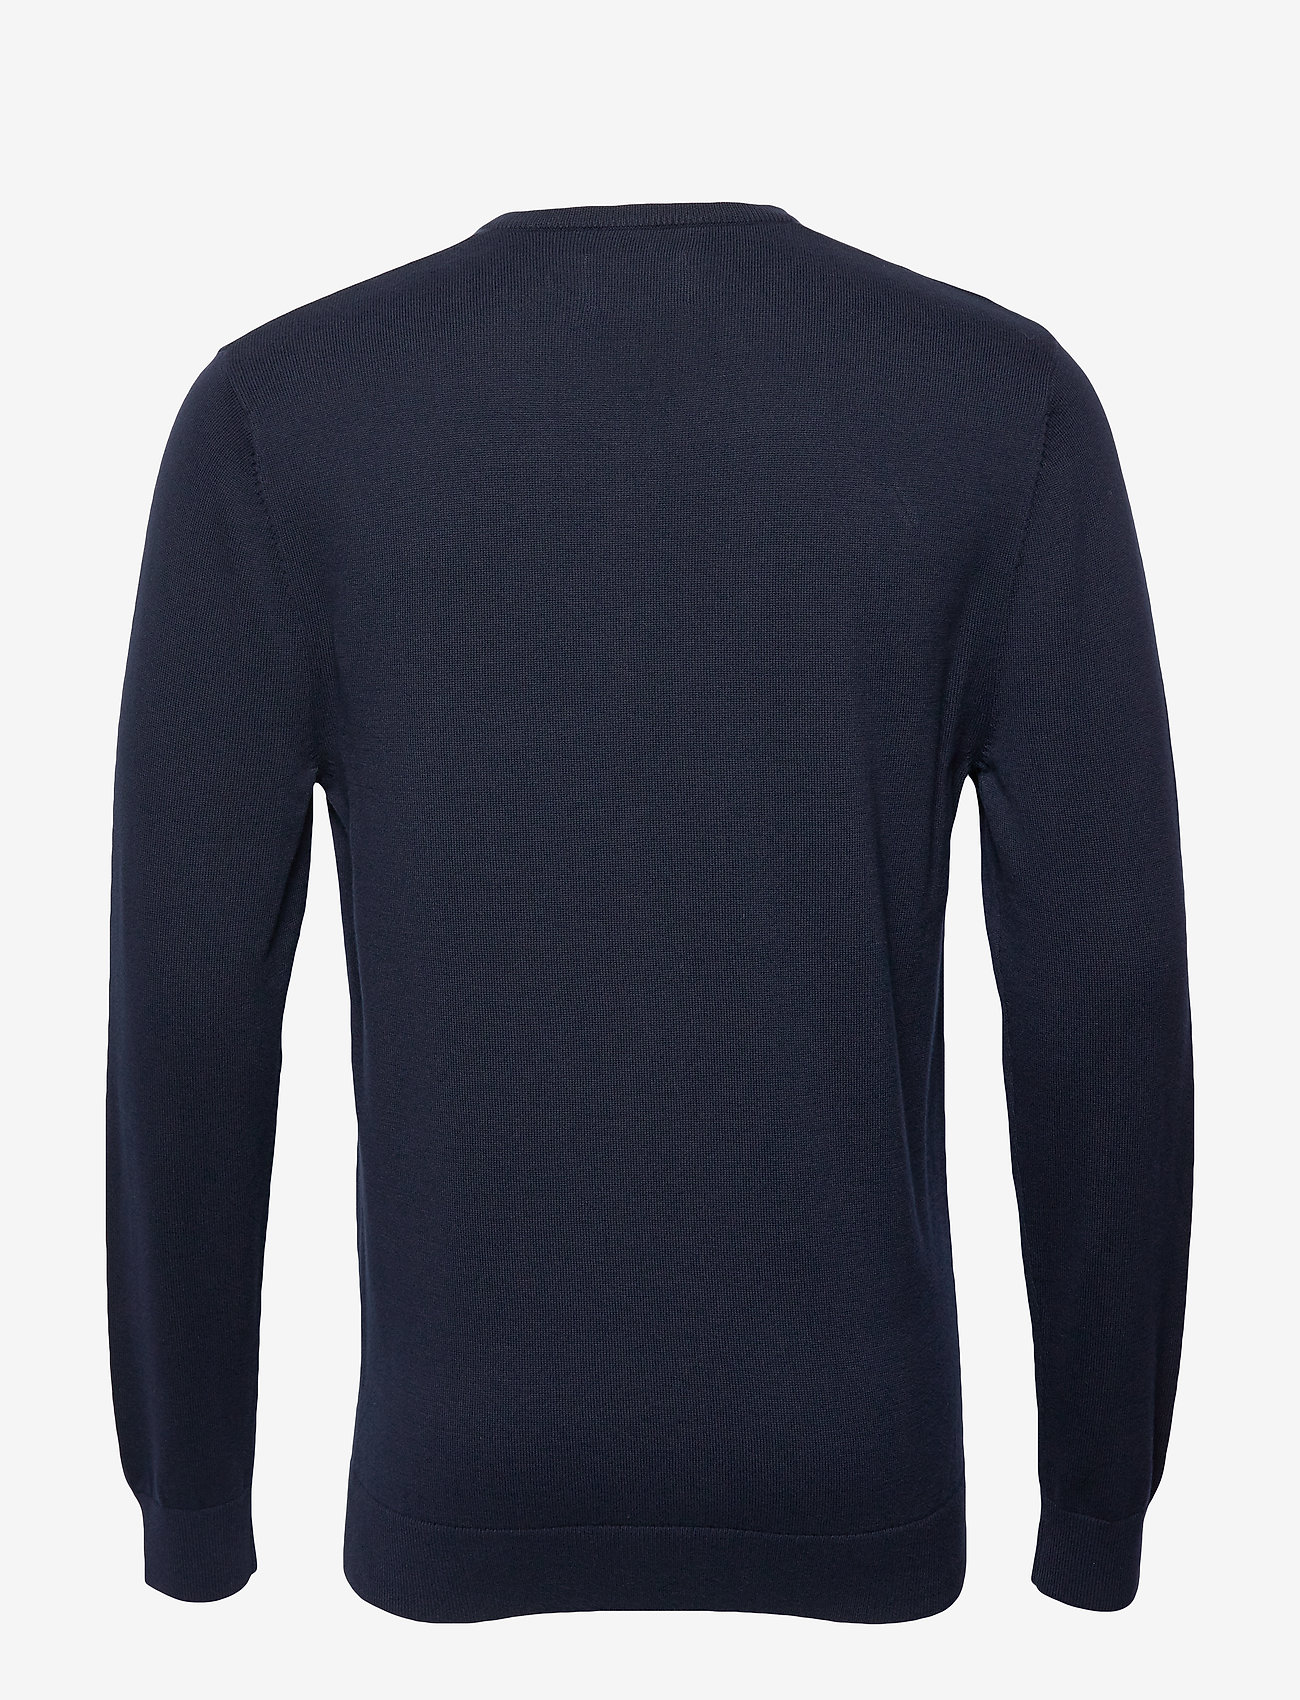 Allen V-neck Sweater (Dark Blue) (99 €) - Lexington Clothing ZZiGU